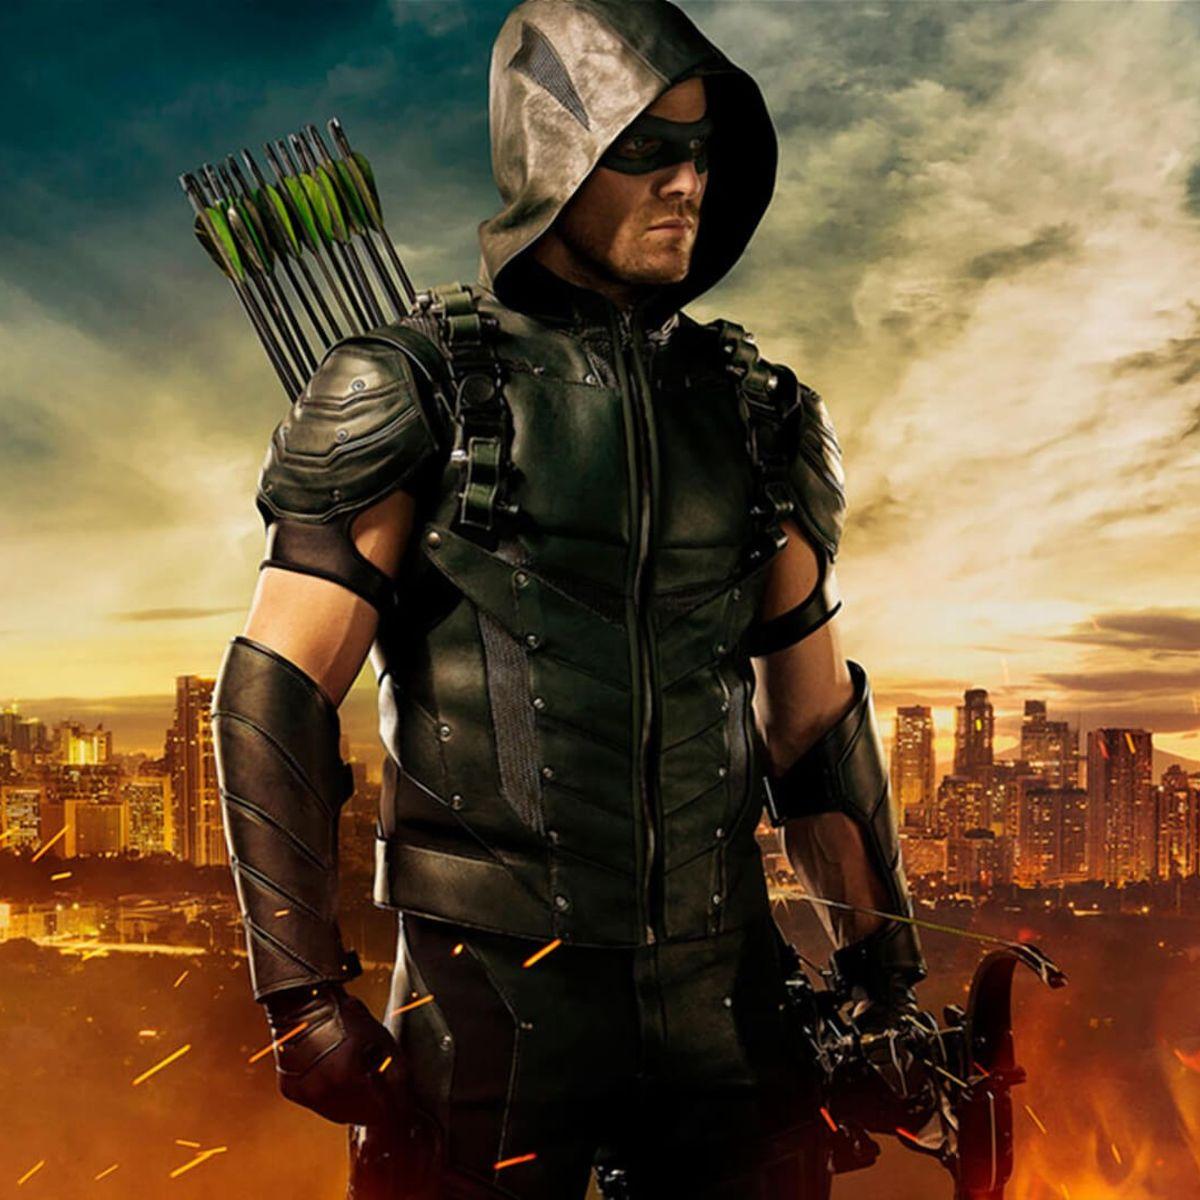 arrow-2015-season-4-new-suit.jpg